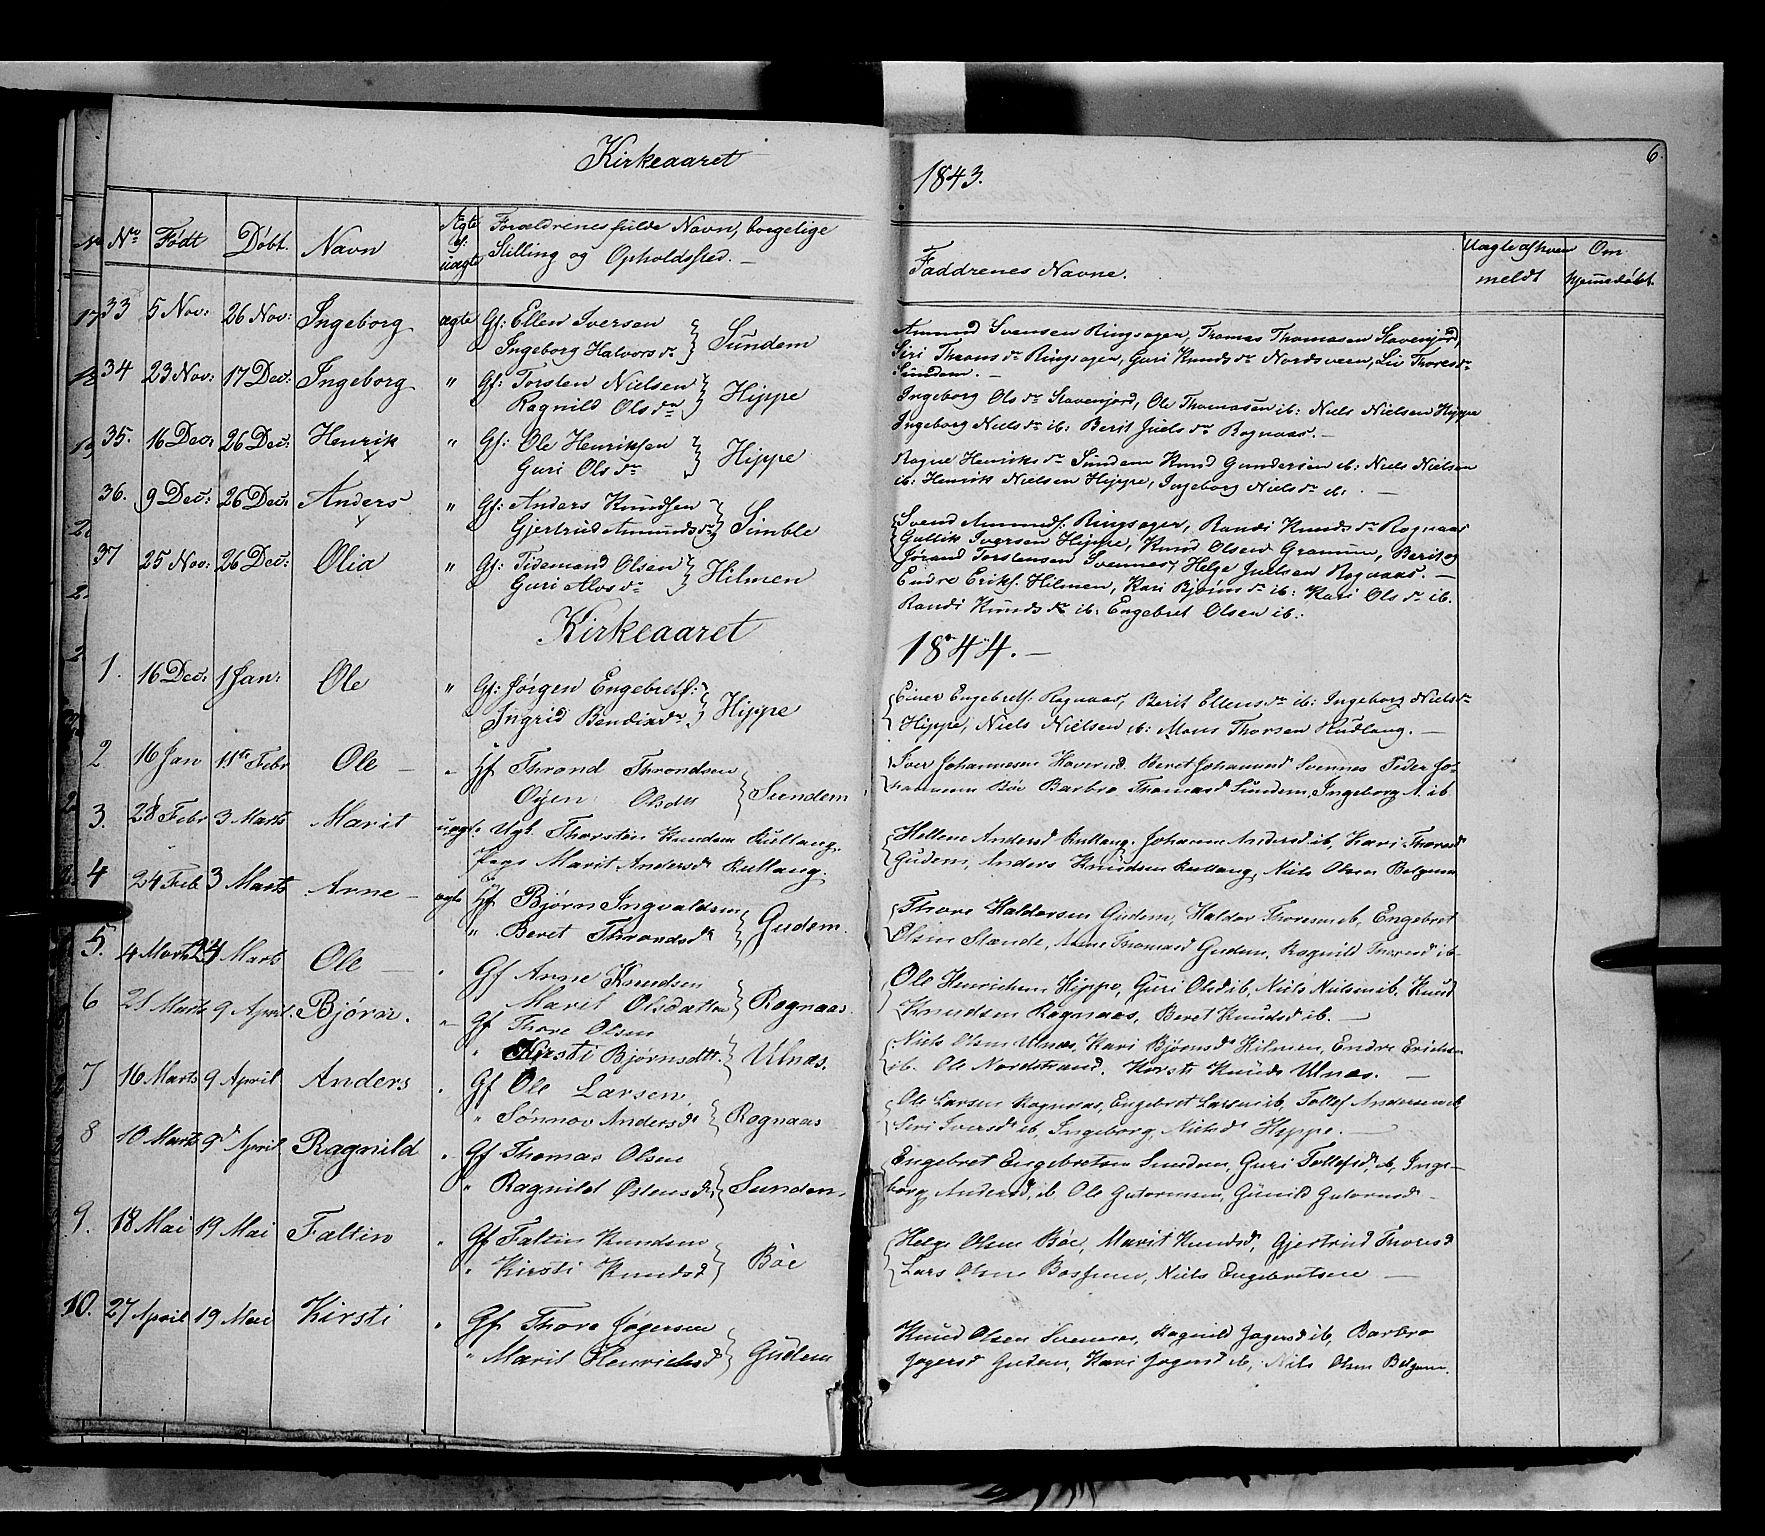 SAH, Nord-Aurdal prestekontor, Ministerialbok nr. 6, 1842-1863, s. 6